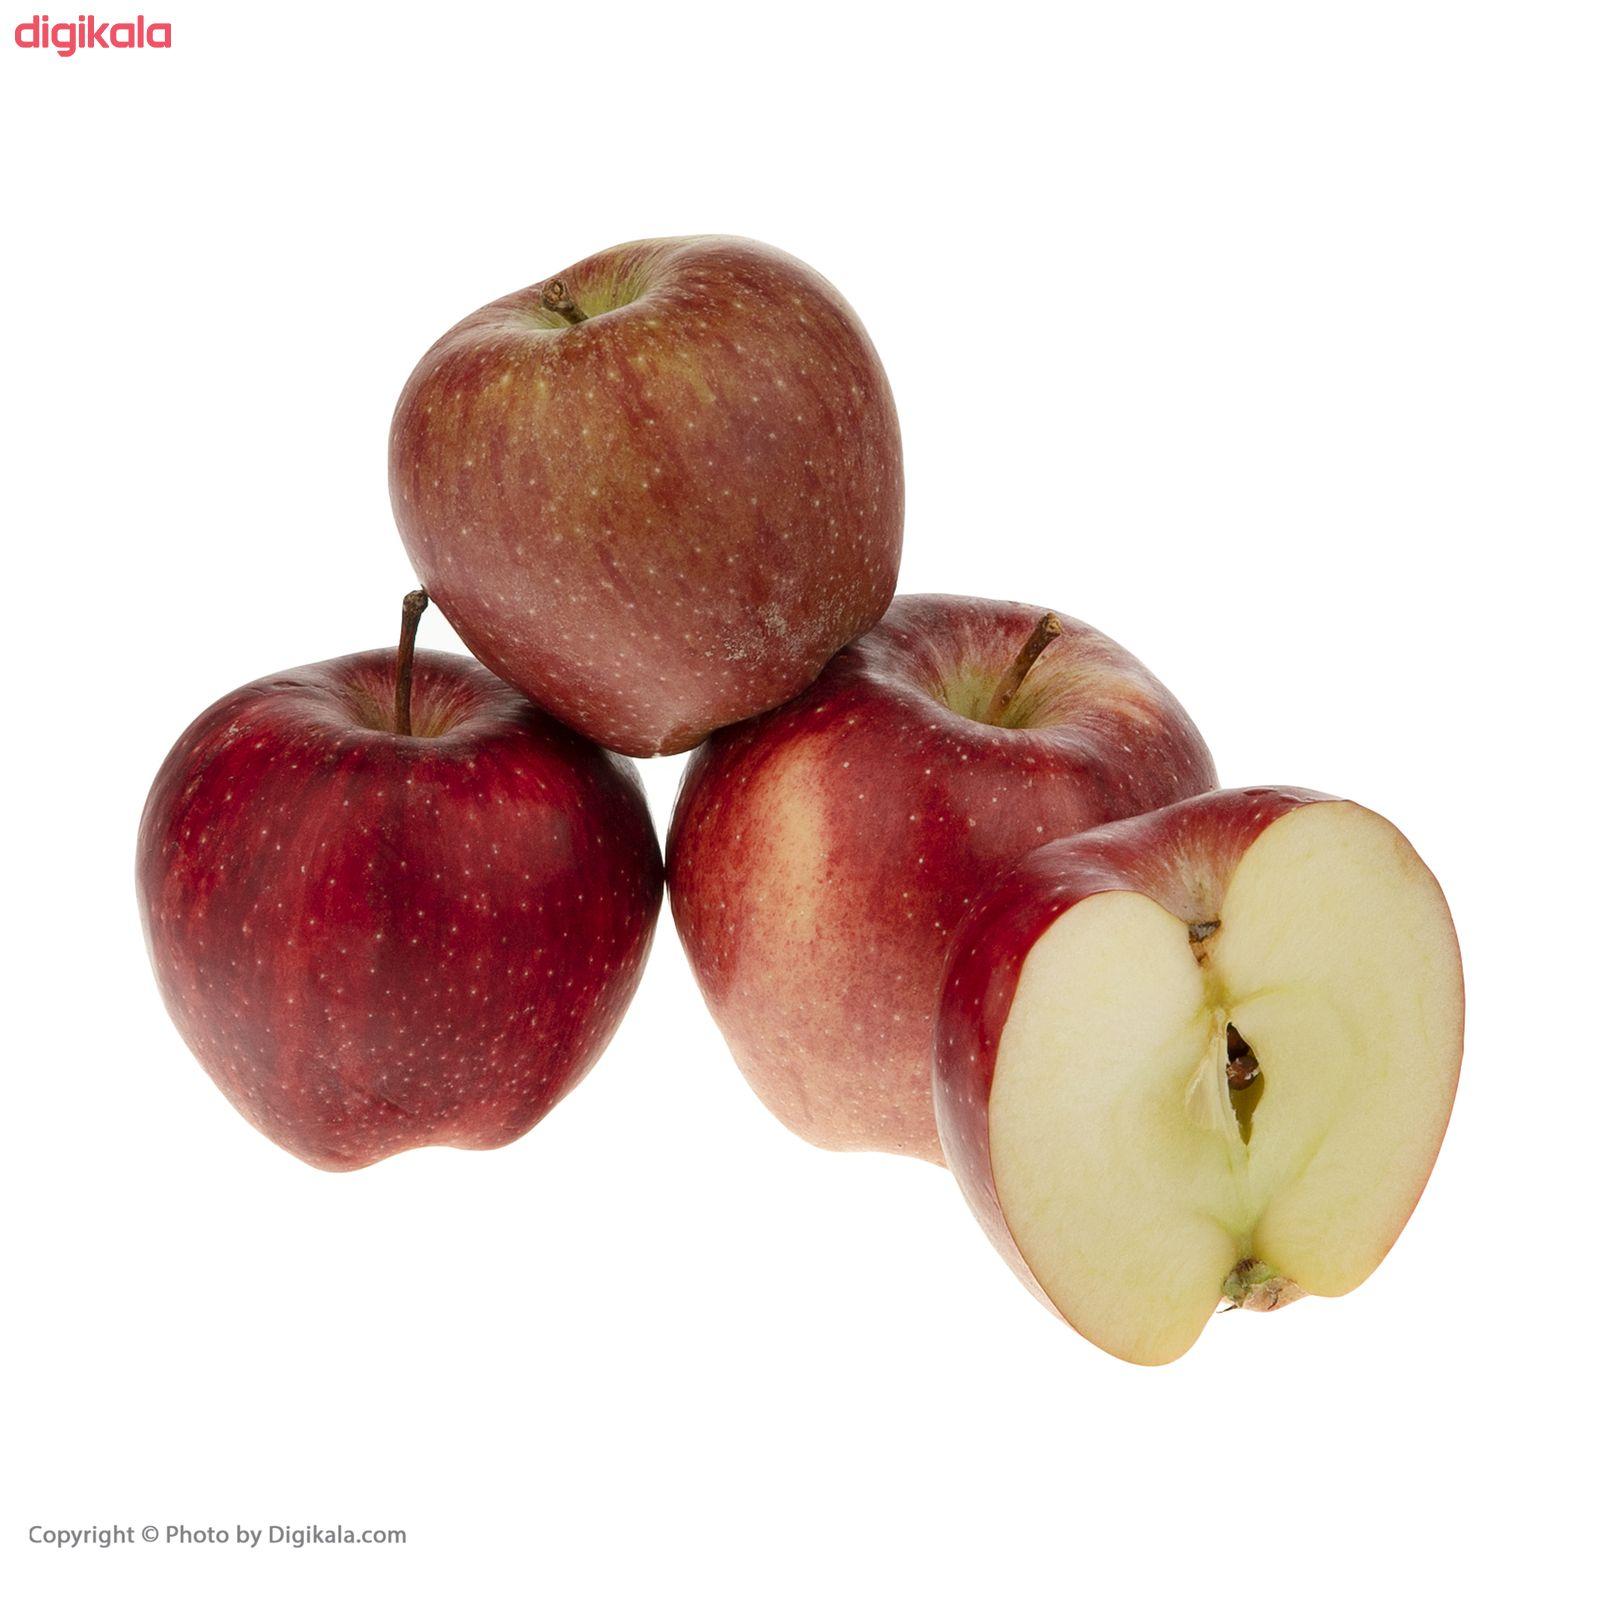 سیب قرمز دماوند فله - 1 کیلوگرم main 1 3